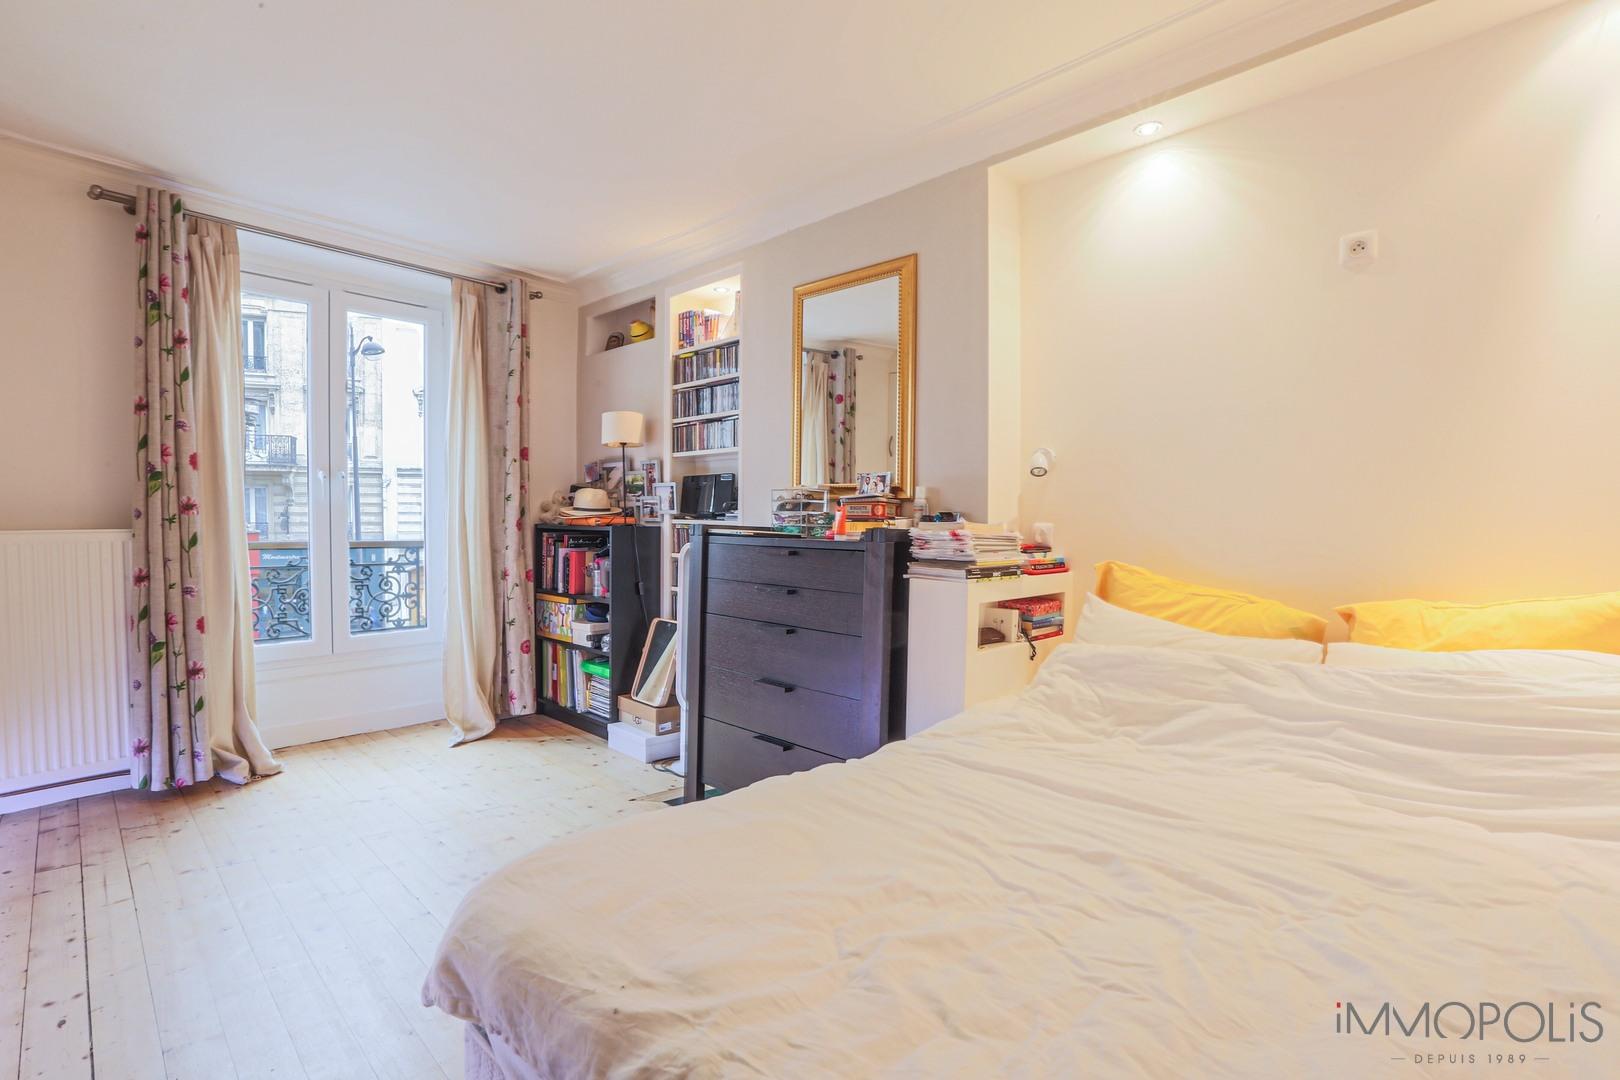 VILLAGE RAmey, Beautiful 2/3 room apartment of 53m² 2